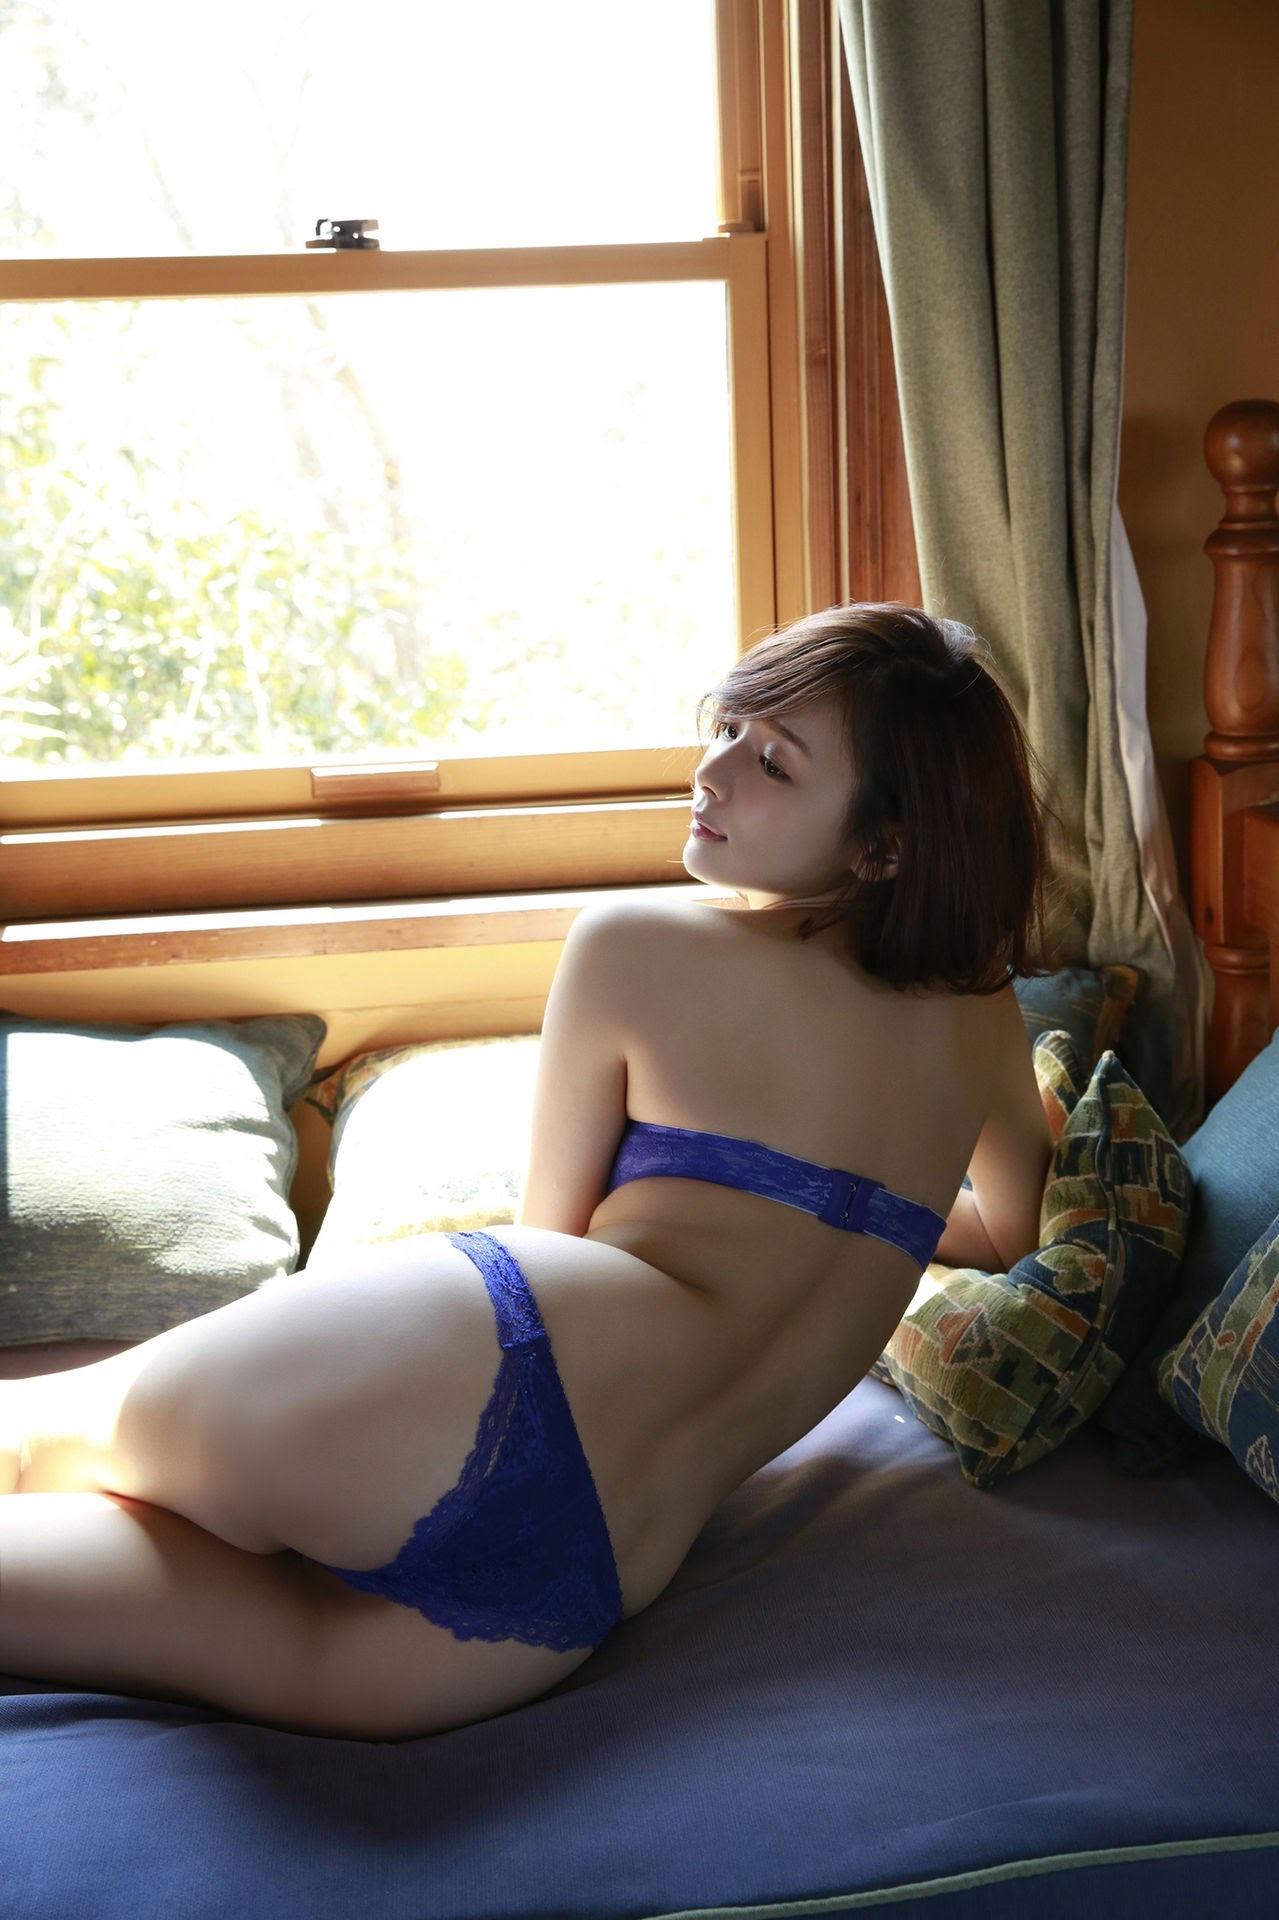 23 years old Shaka Okada, who is also a professional mahjong player024